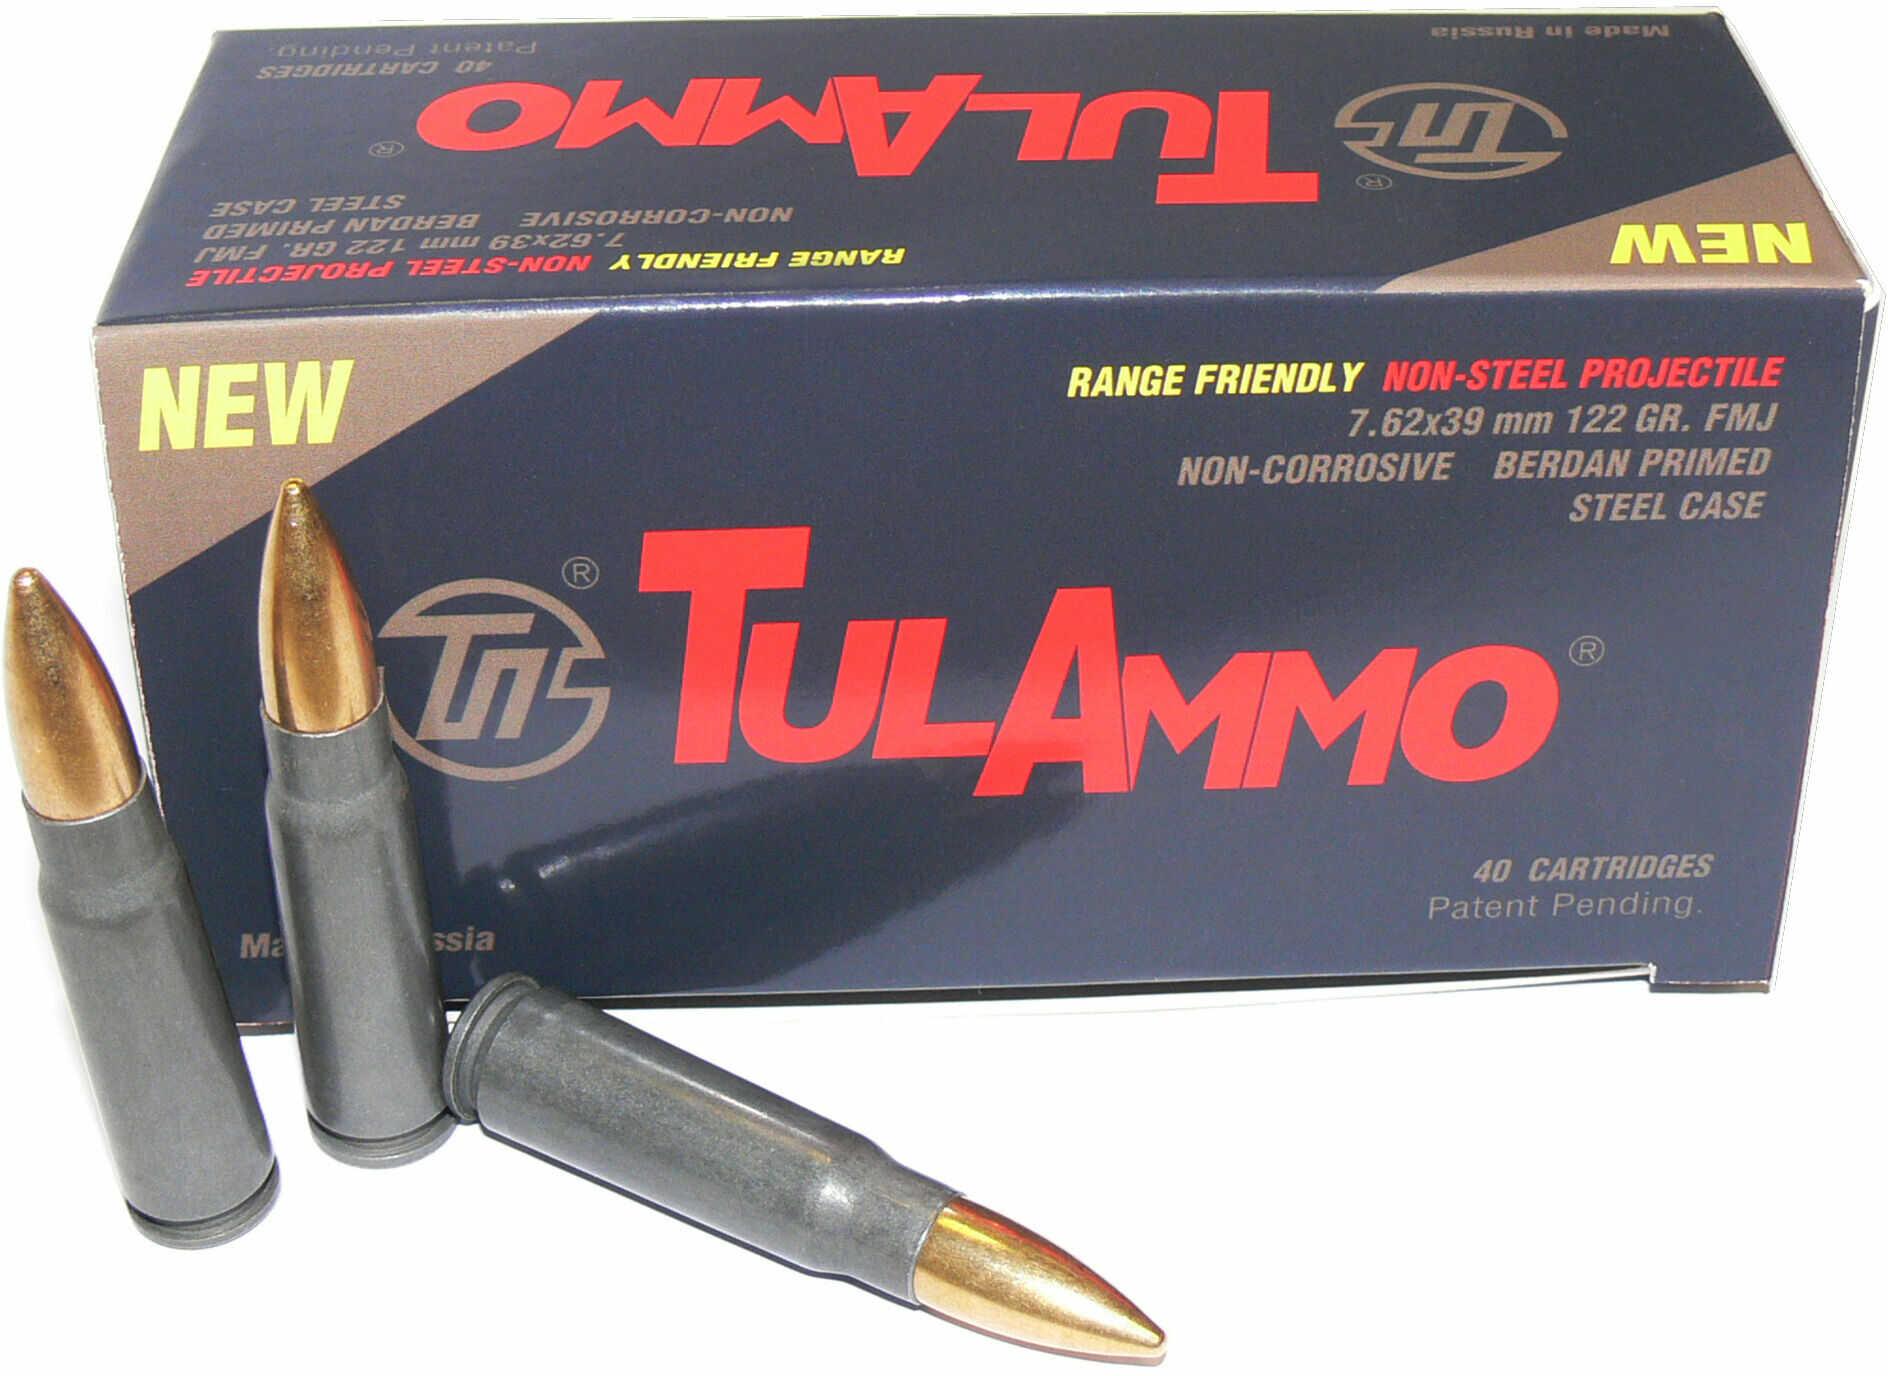 Tulammo Centerfire Rifle 7.62x39mm 122 Grain Full Metal Jacket 40 Box UL076215